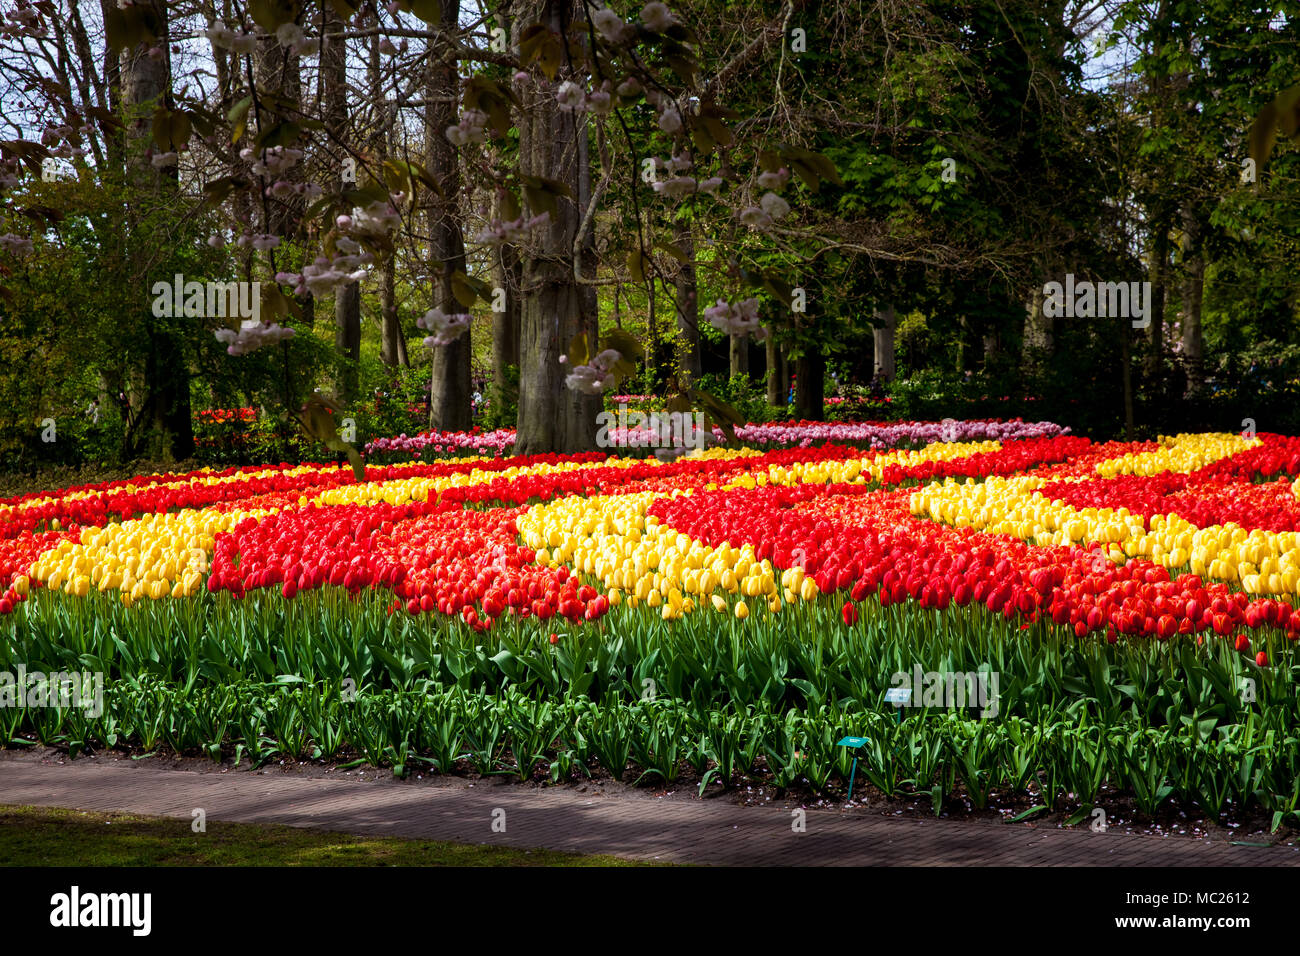 Colorful tulips in Keukenhof park in Amsterdam area, Netherlands - Stock Image